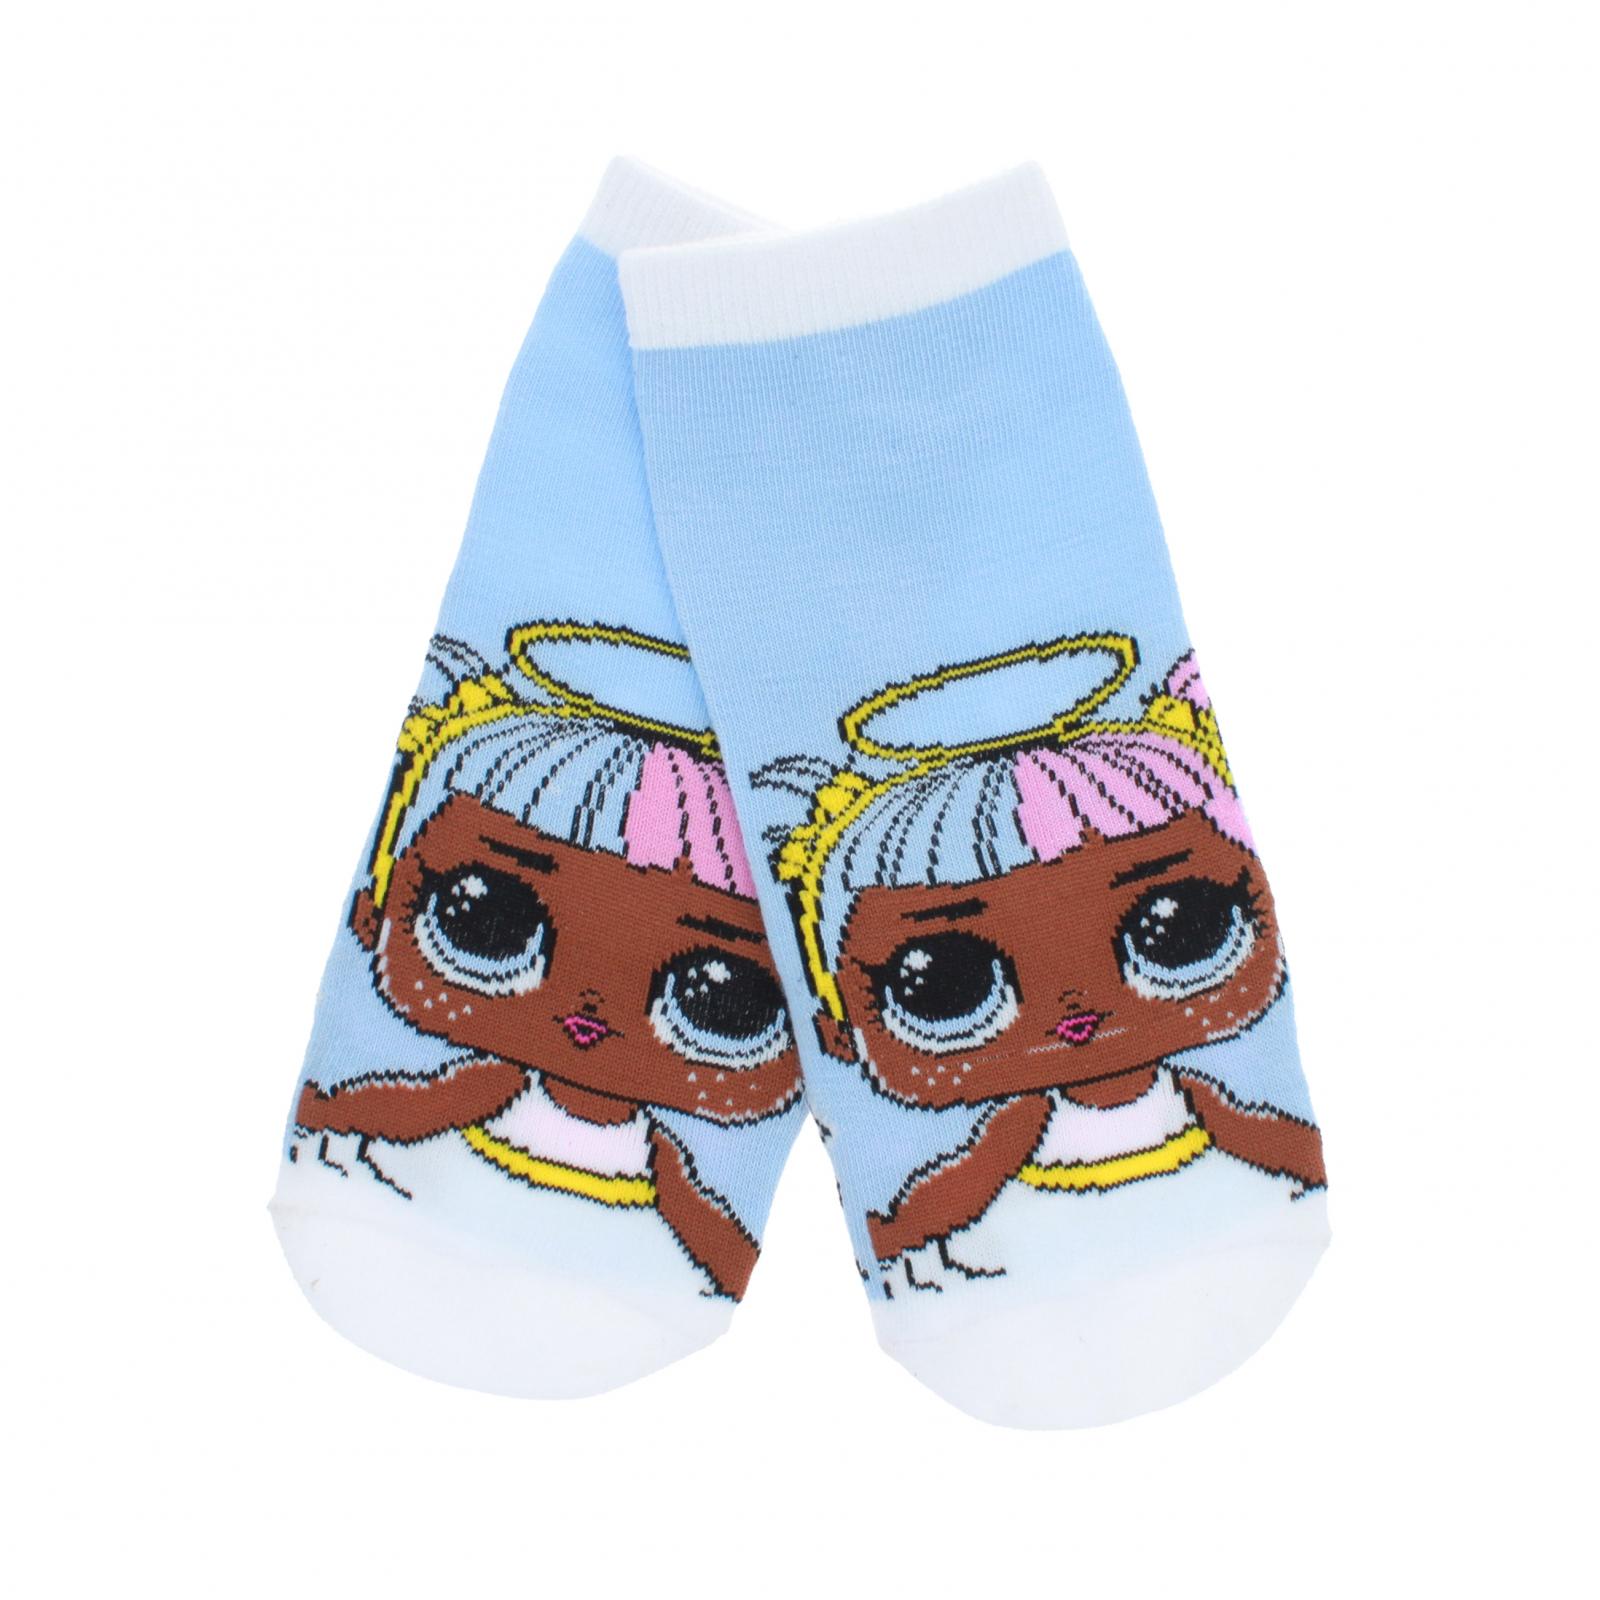 LOL Surprise Girls Ankle Socks Size 6-8.5 - Blue